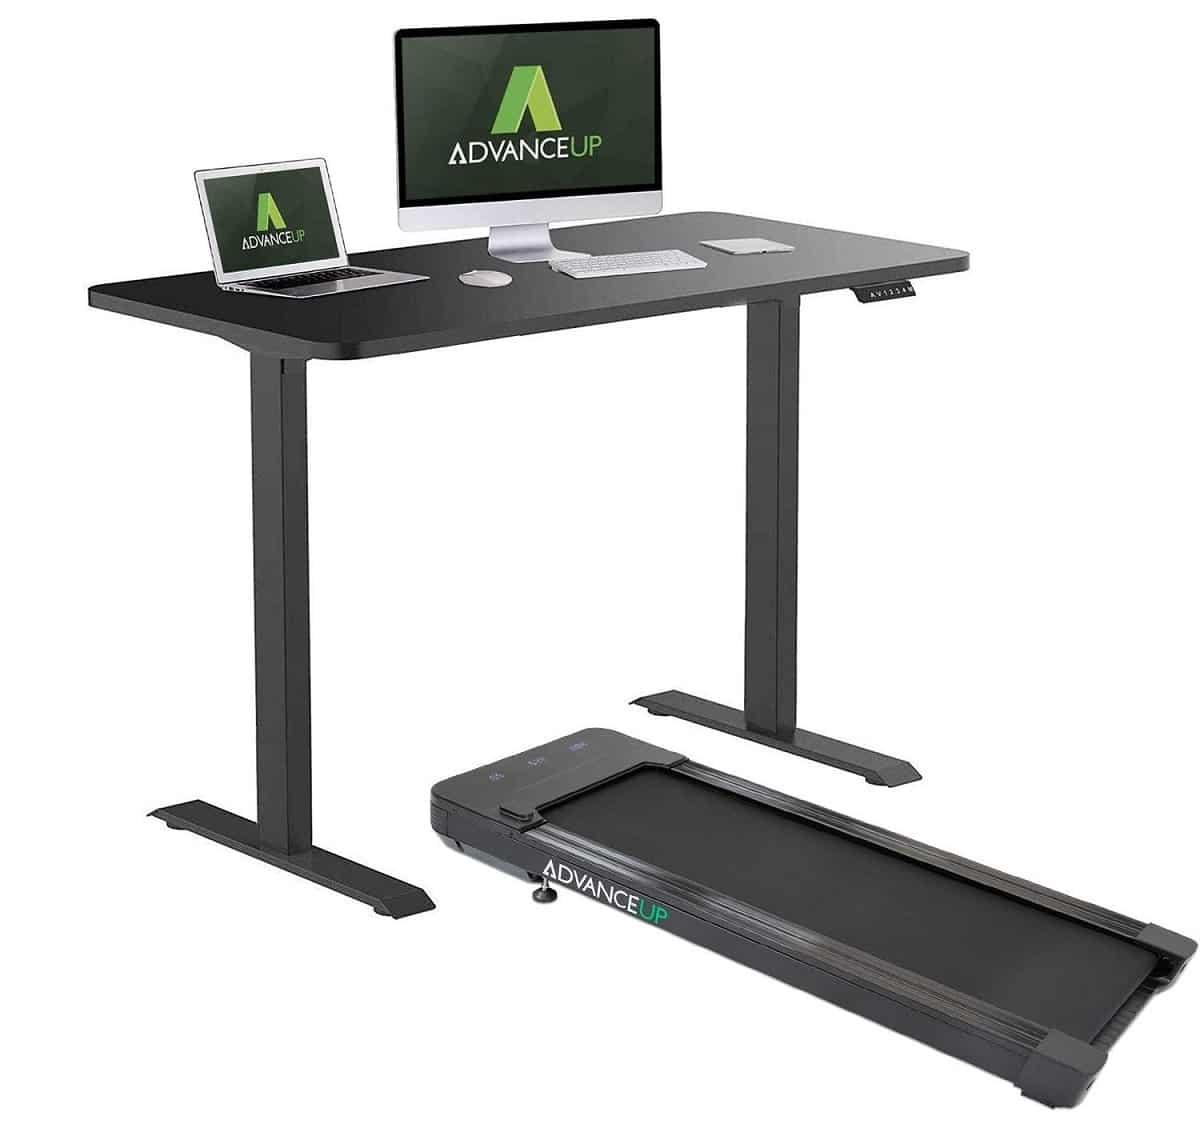 advanceup walking treadmill image